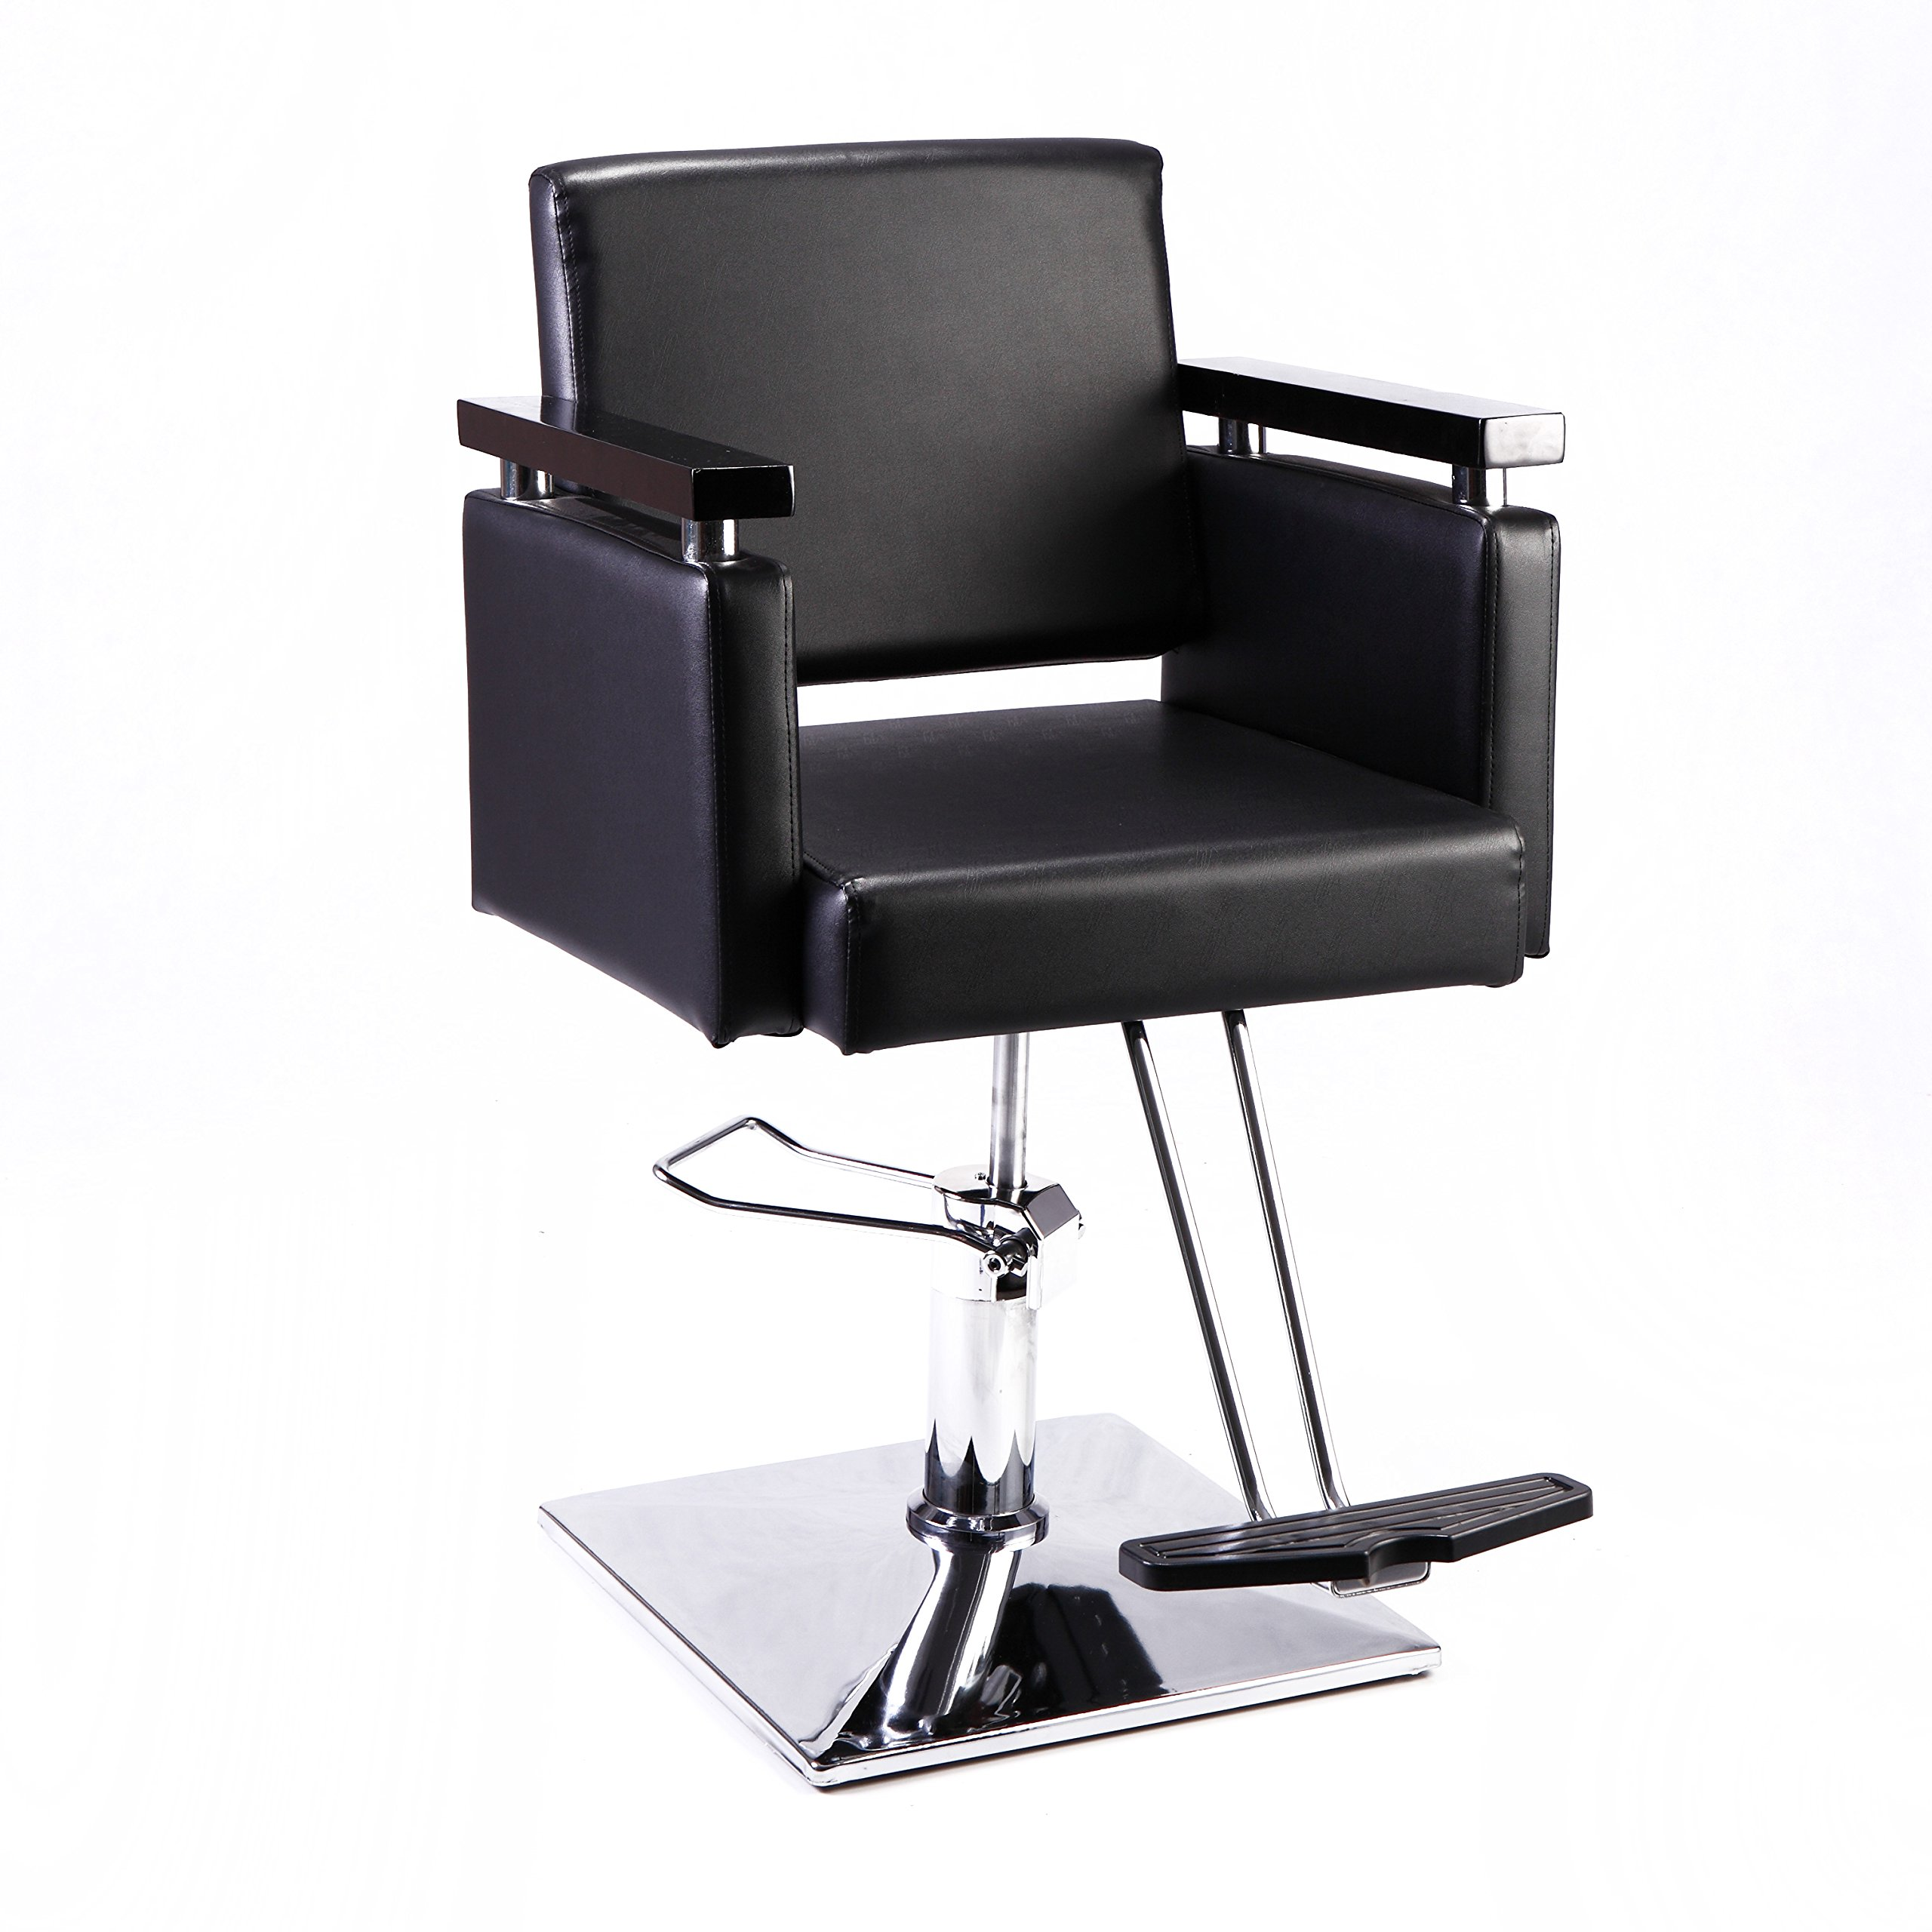 JAXPETY Classic Hydraulic Barber Chair Styling Salon Beauty Spa Shampoo Hair Styling Equipment Square Base Black